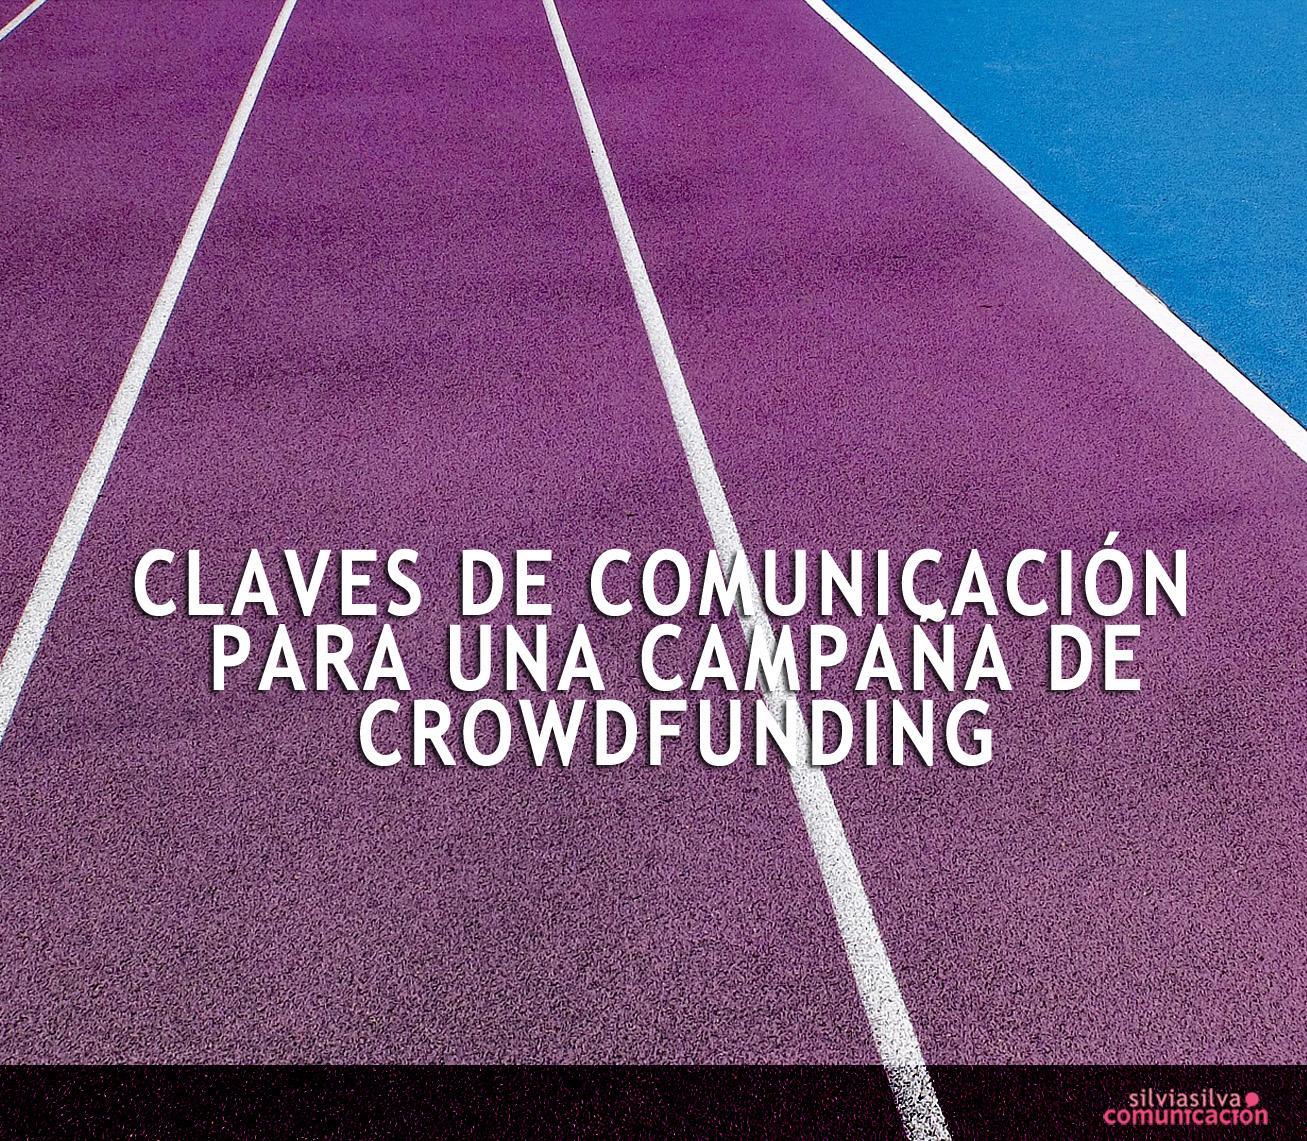 estrategia de comunicación en crowdfunding